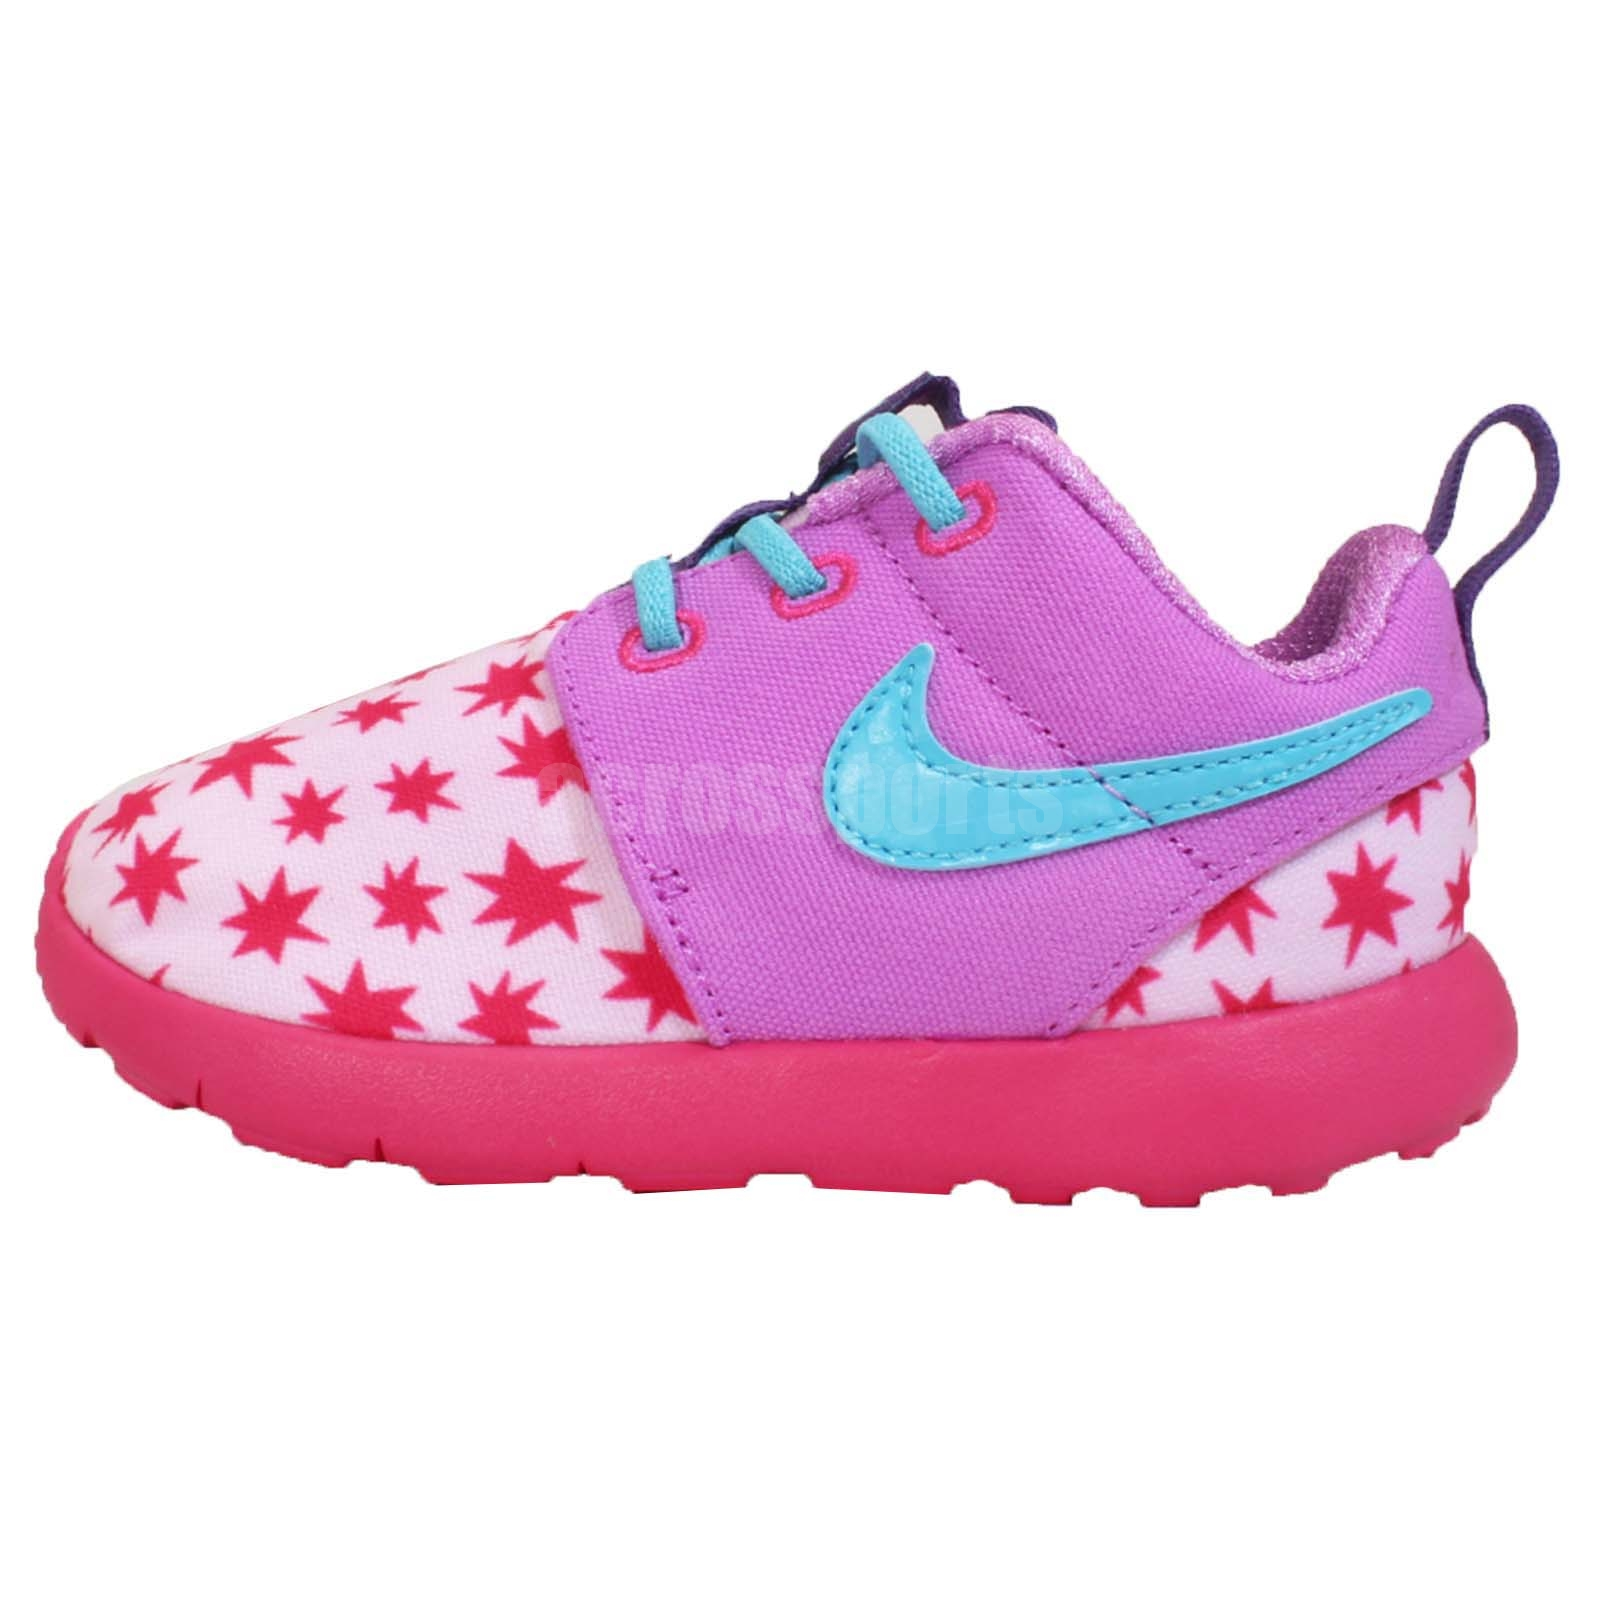 nike roshe one print tdv rosherun pink blue toddler baby